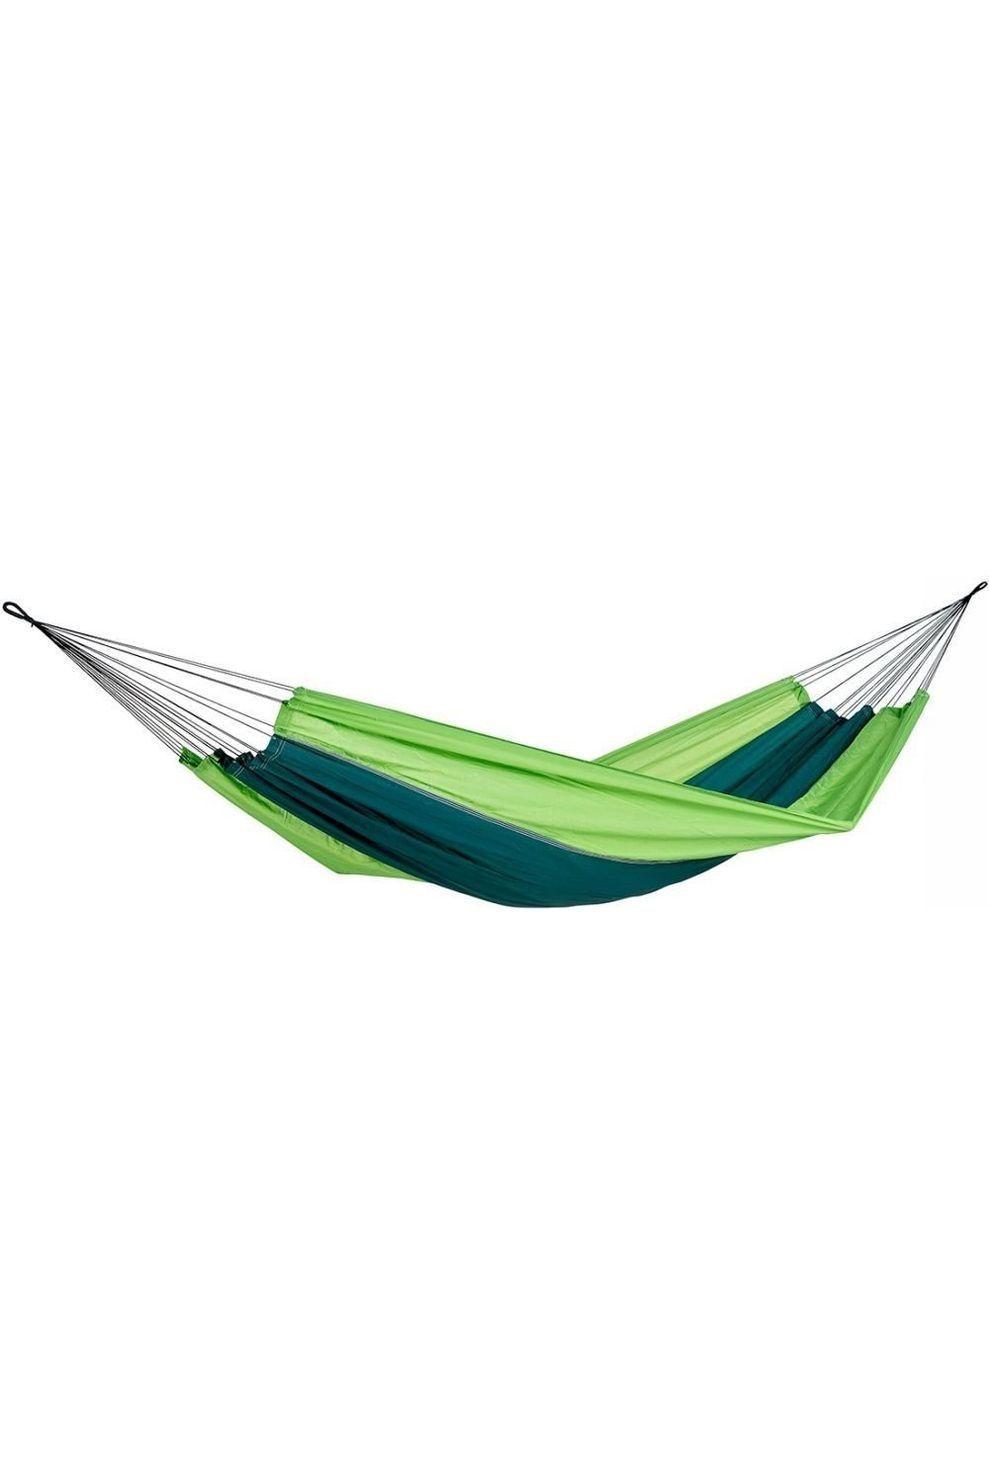 Amazonas Hangmat Silk Traveller - Groen